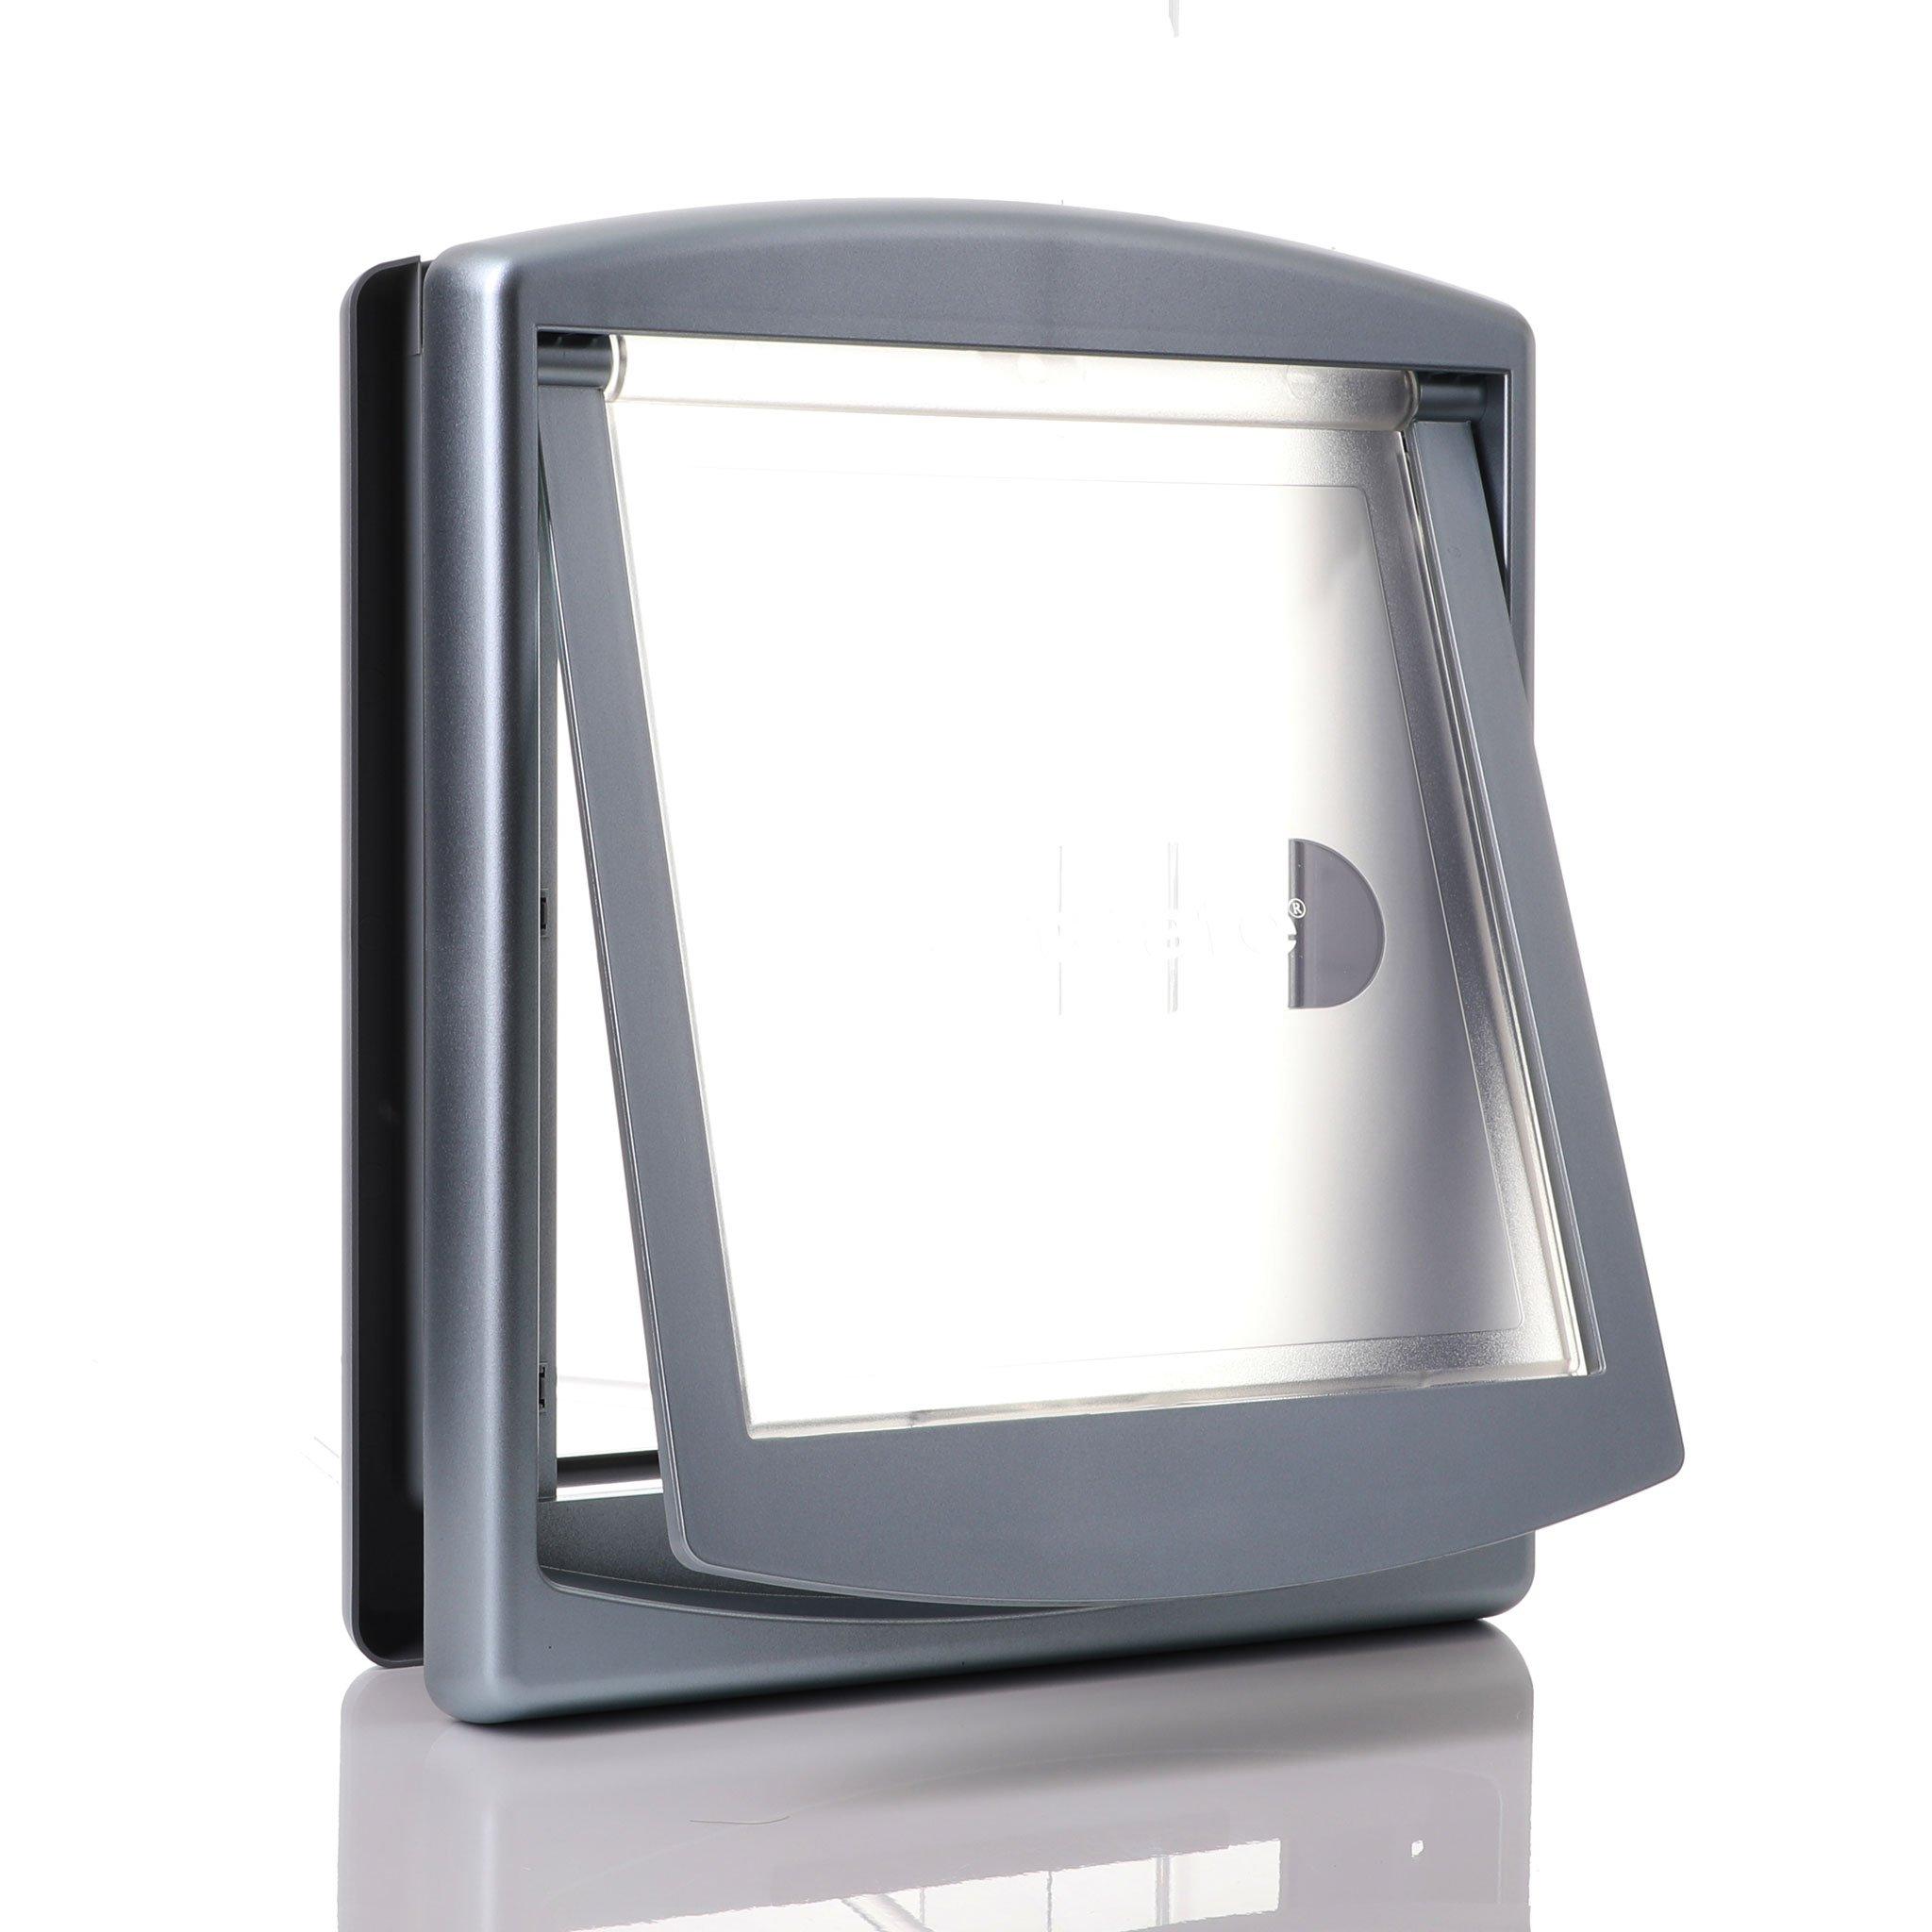 medium dog door clear frame draught proofing grey farme